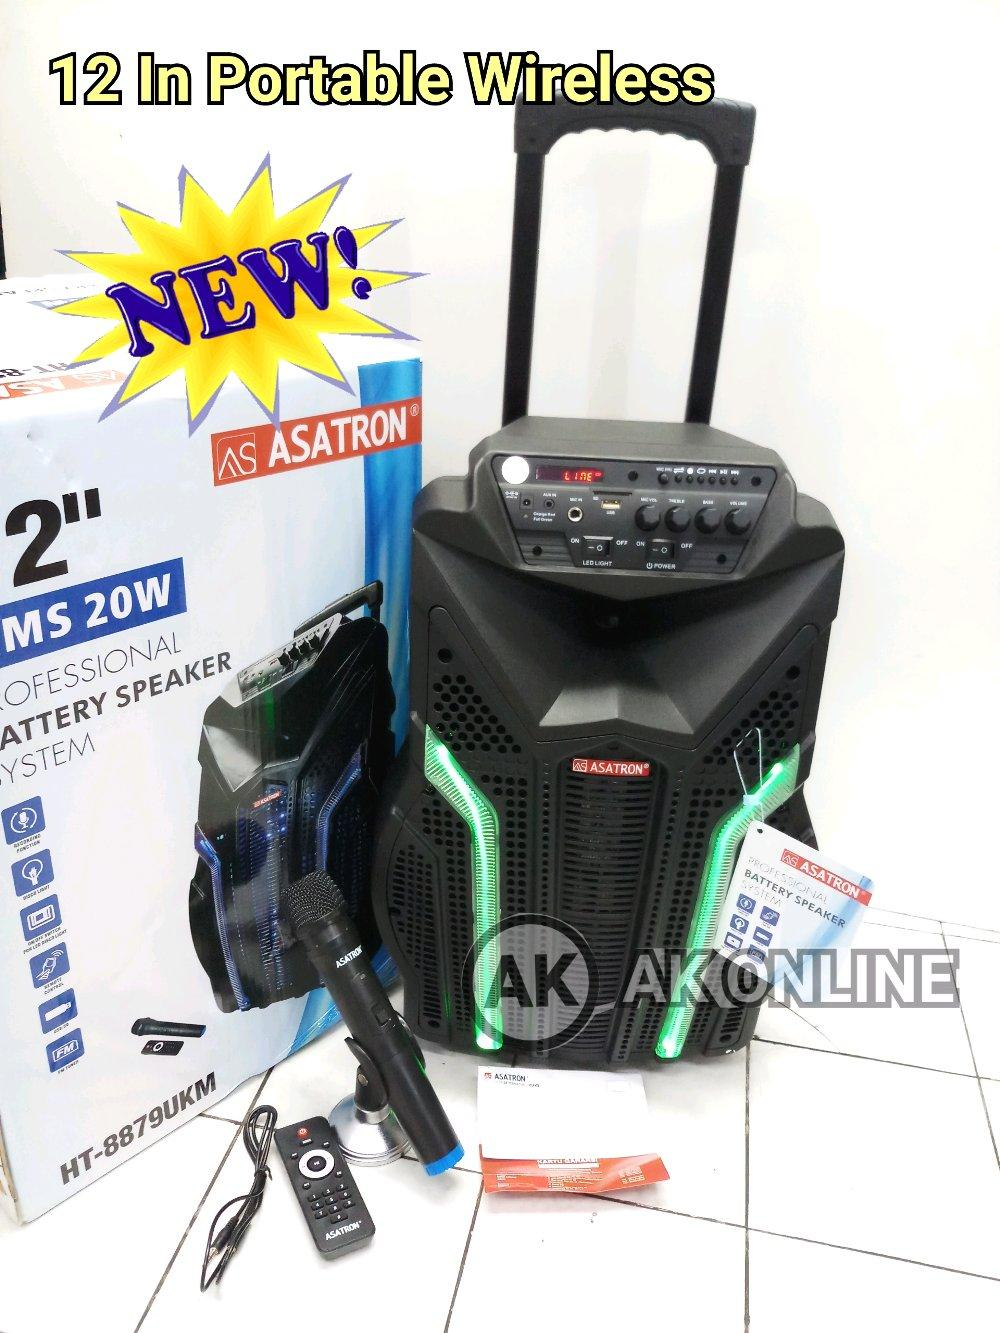 Portable Meeting Wireless 12 in ASATRON HT8879UKM HT 8879 UKM ORIGINAL